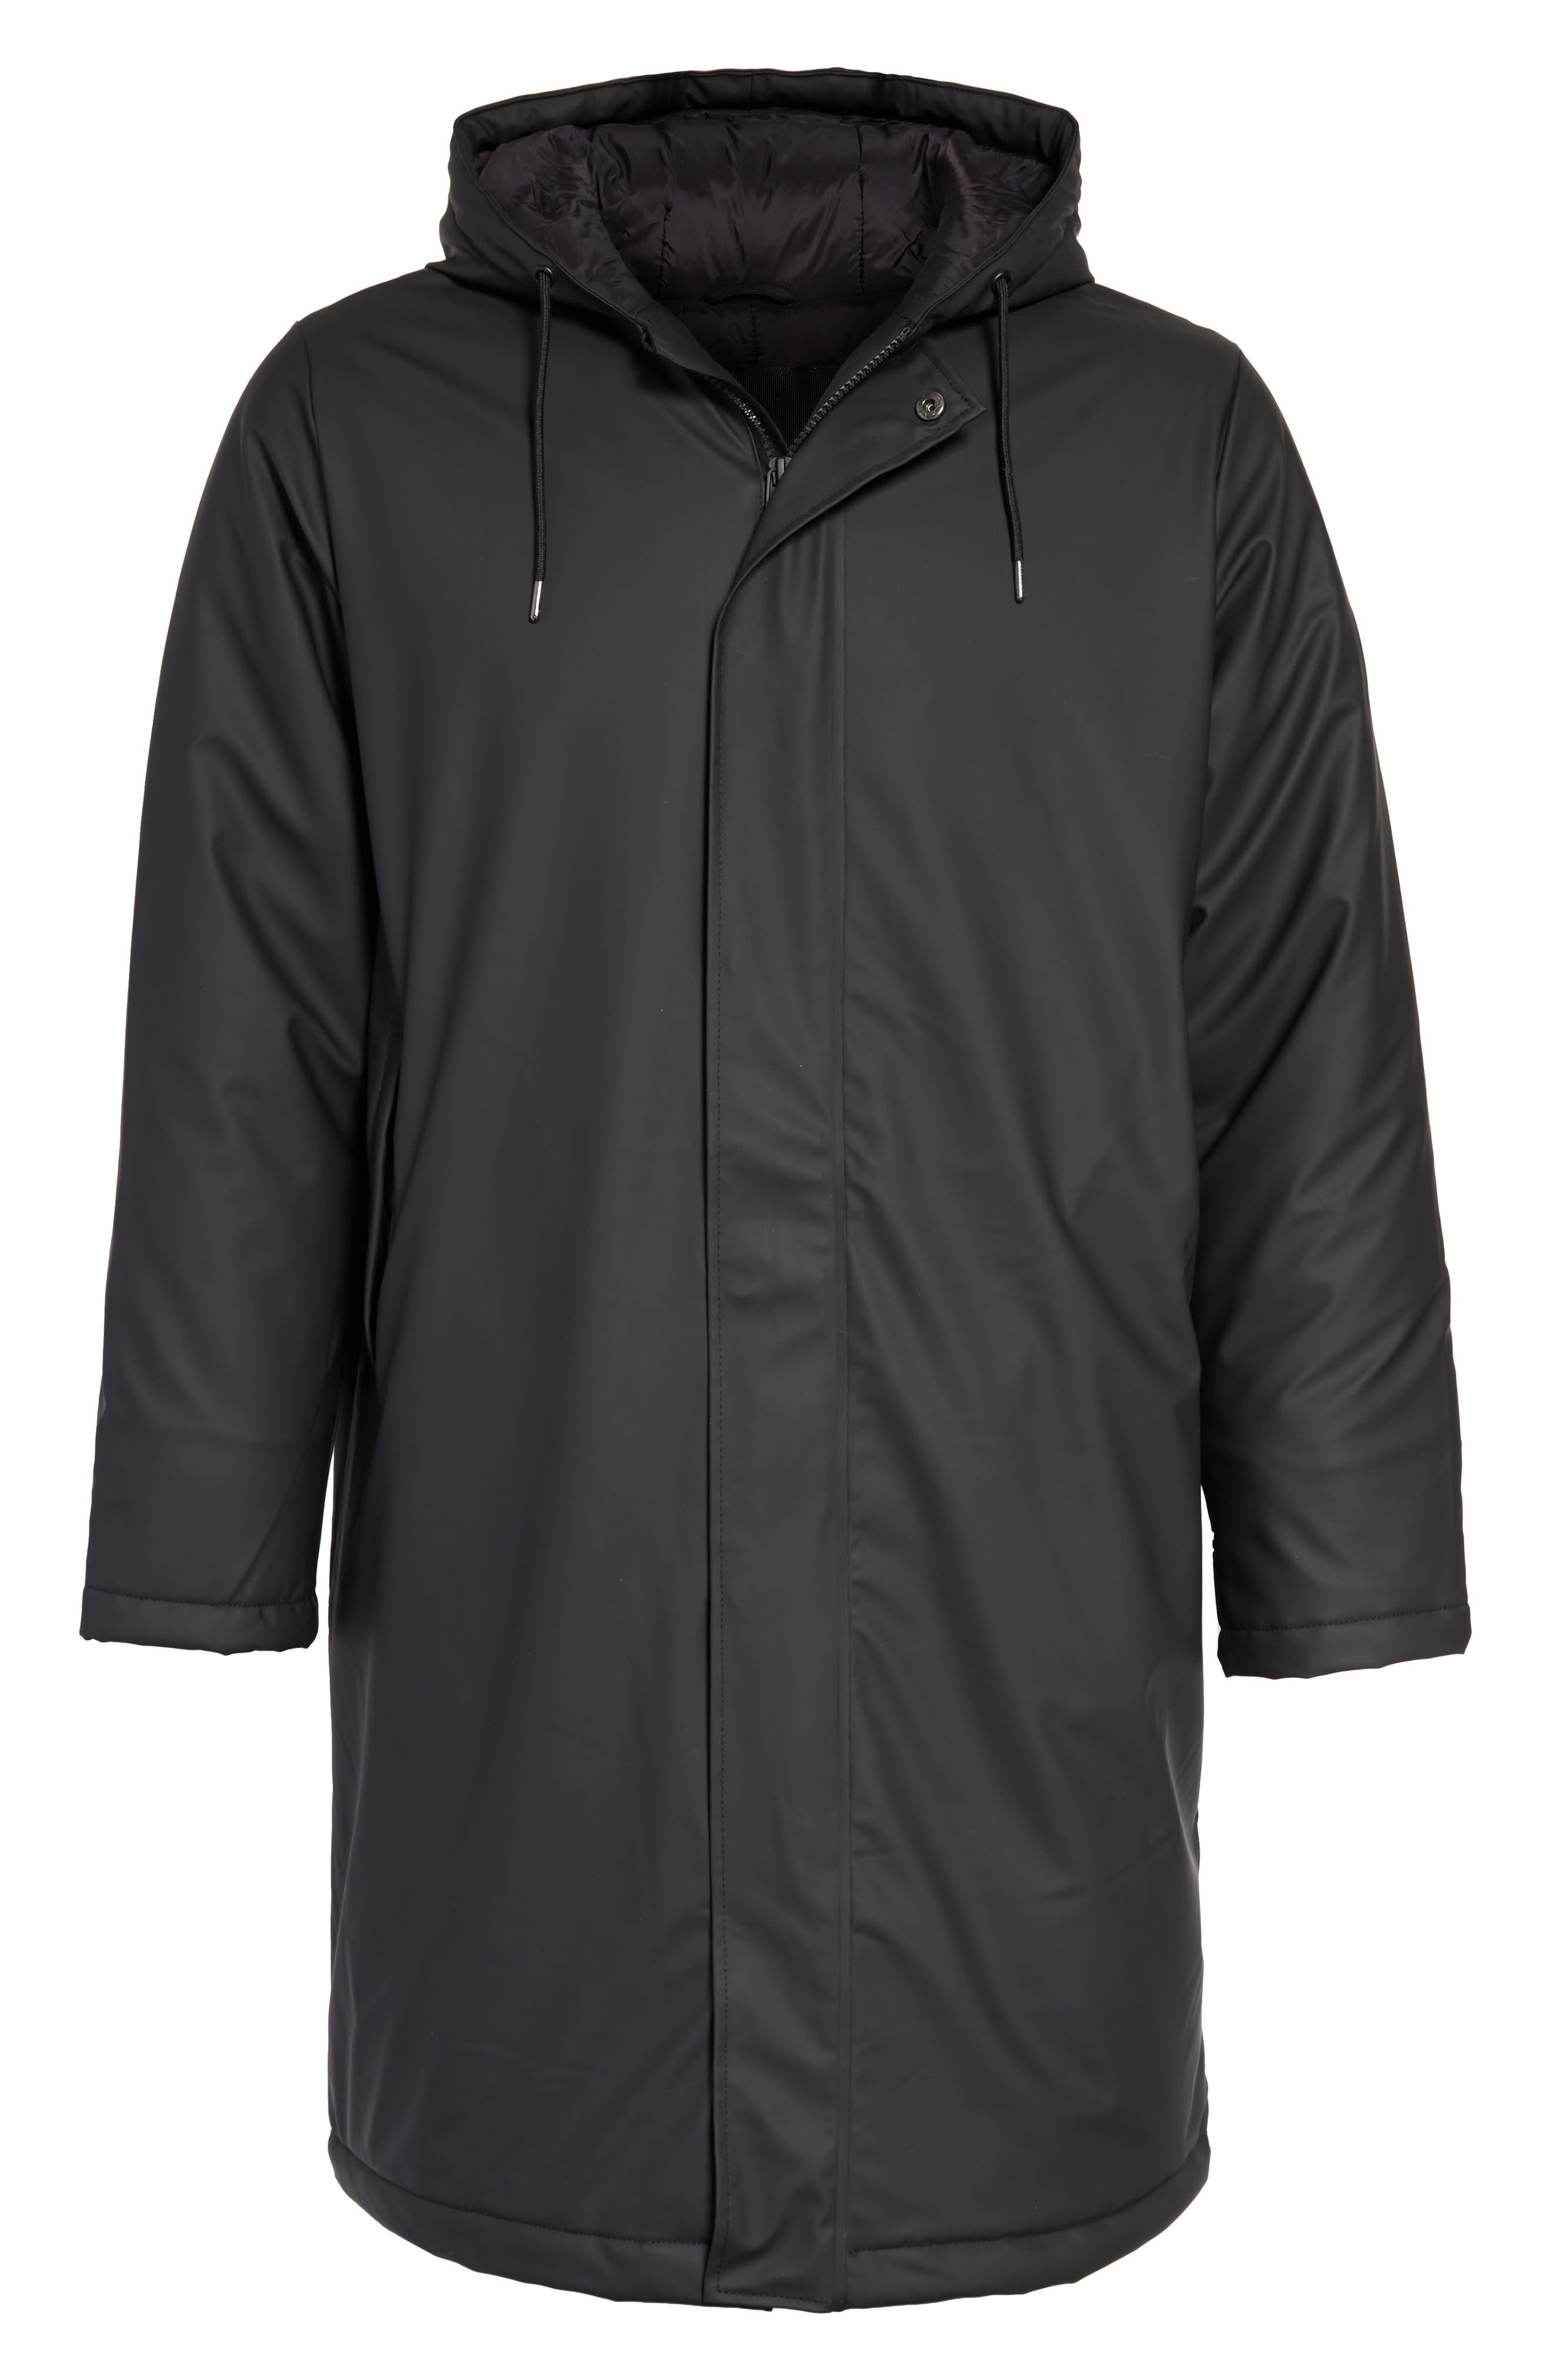 Thermal Hooded Raincoat,                             Alternate thumbnail 5, color,                             BLACK